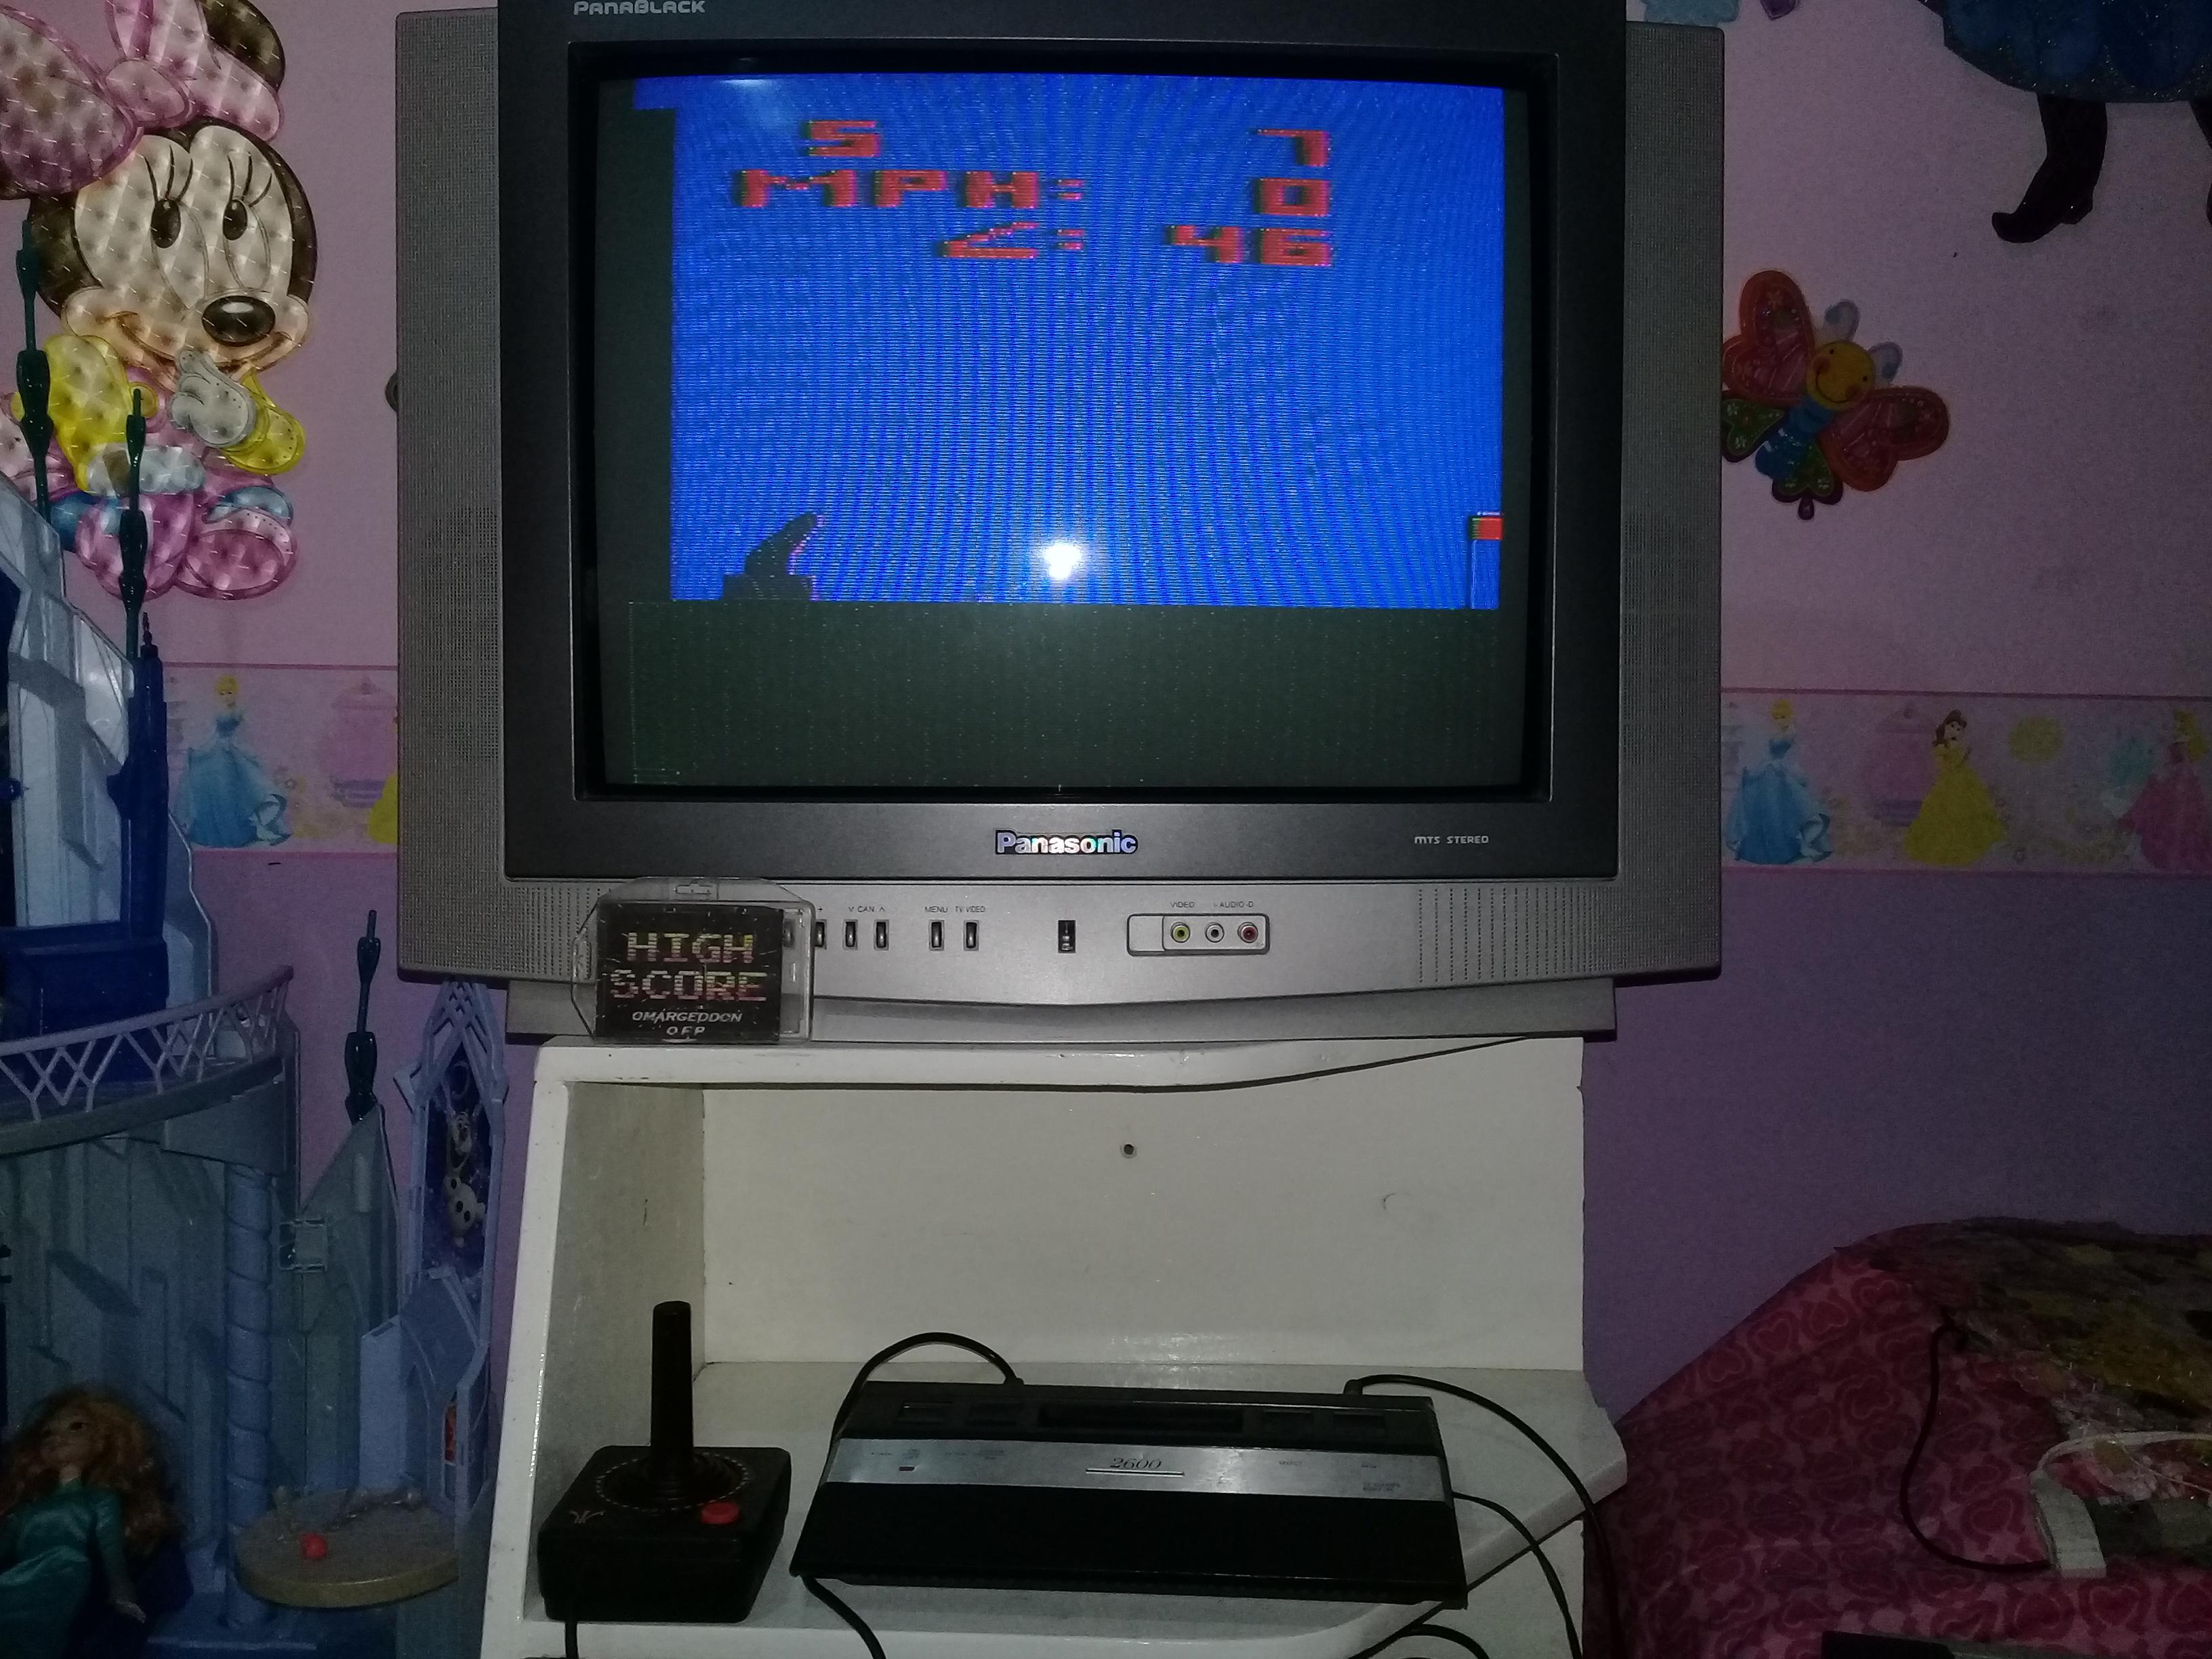 omargeddon: Human Cannonball [Game 4] (Atari 2600 Novice/B) 5 points on 2019-06-04 16:50:21